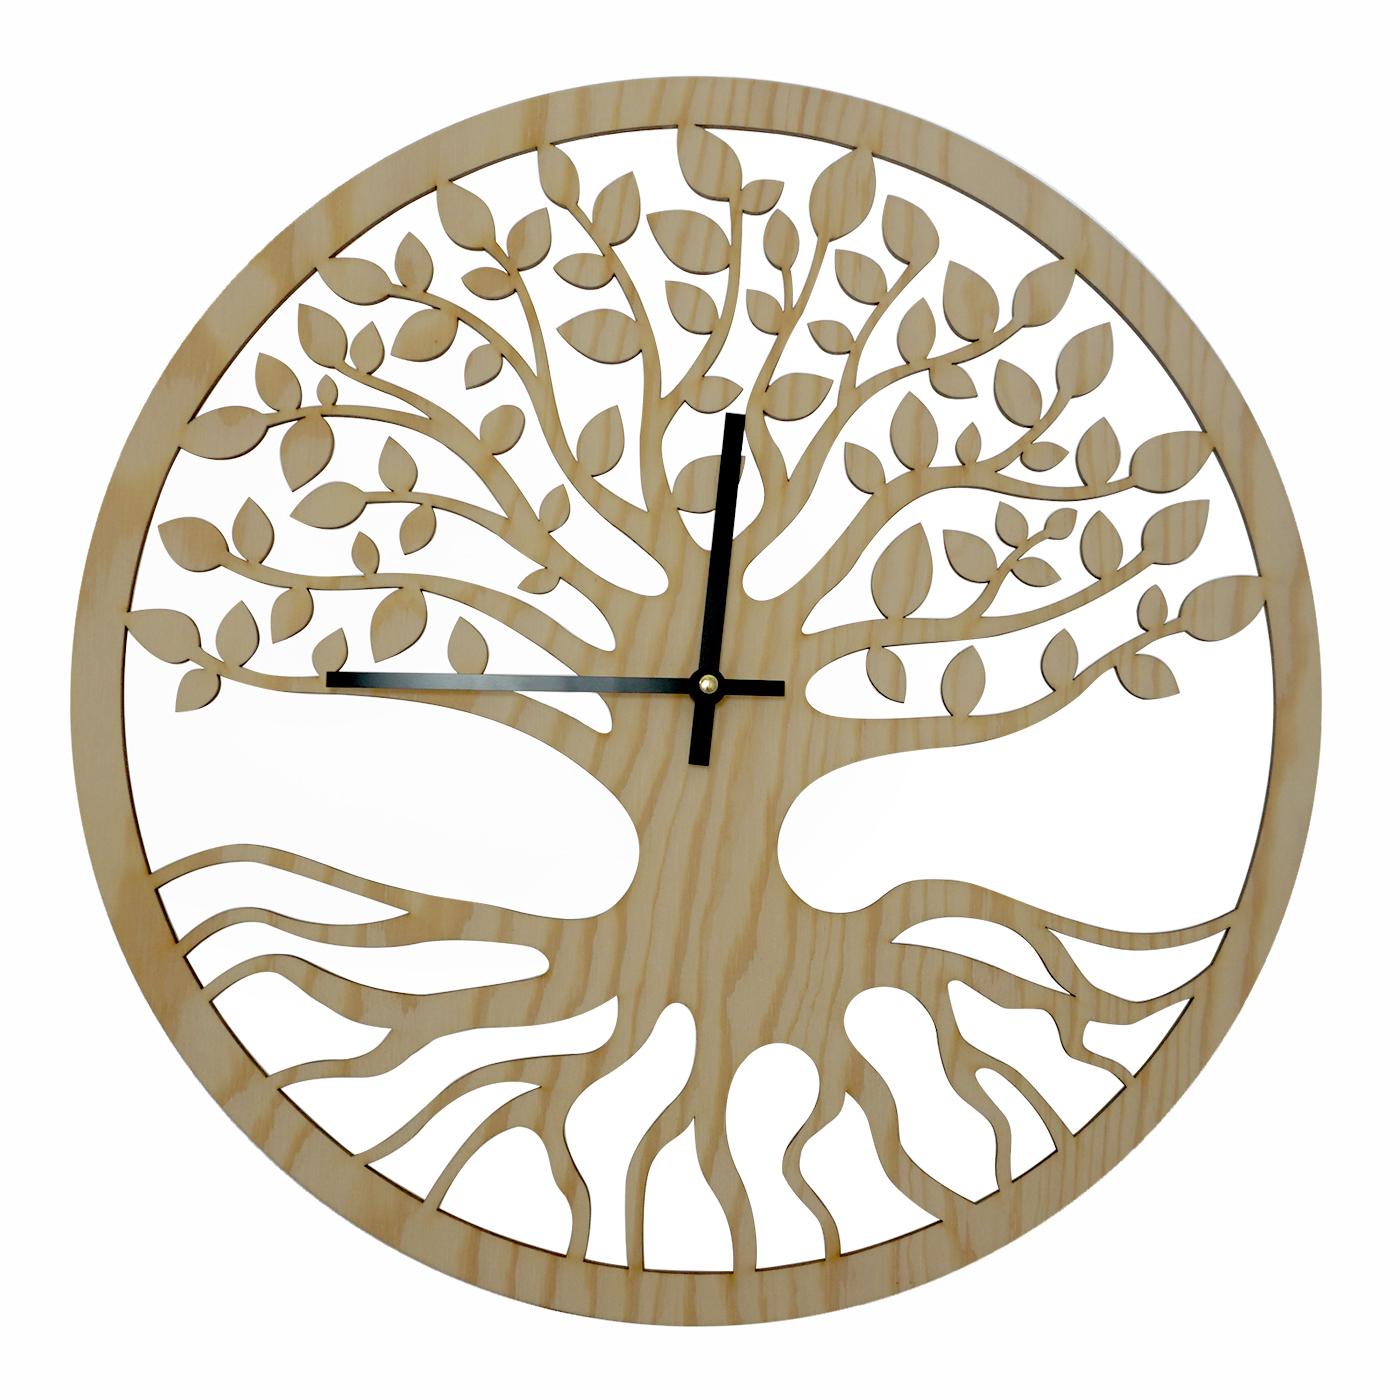 Uhr Baum Des Lebens Punktgenau Werbetechnik E U